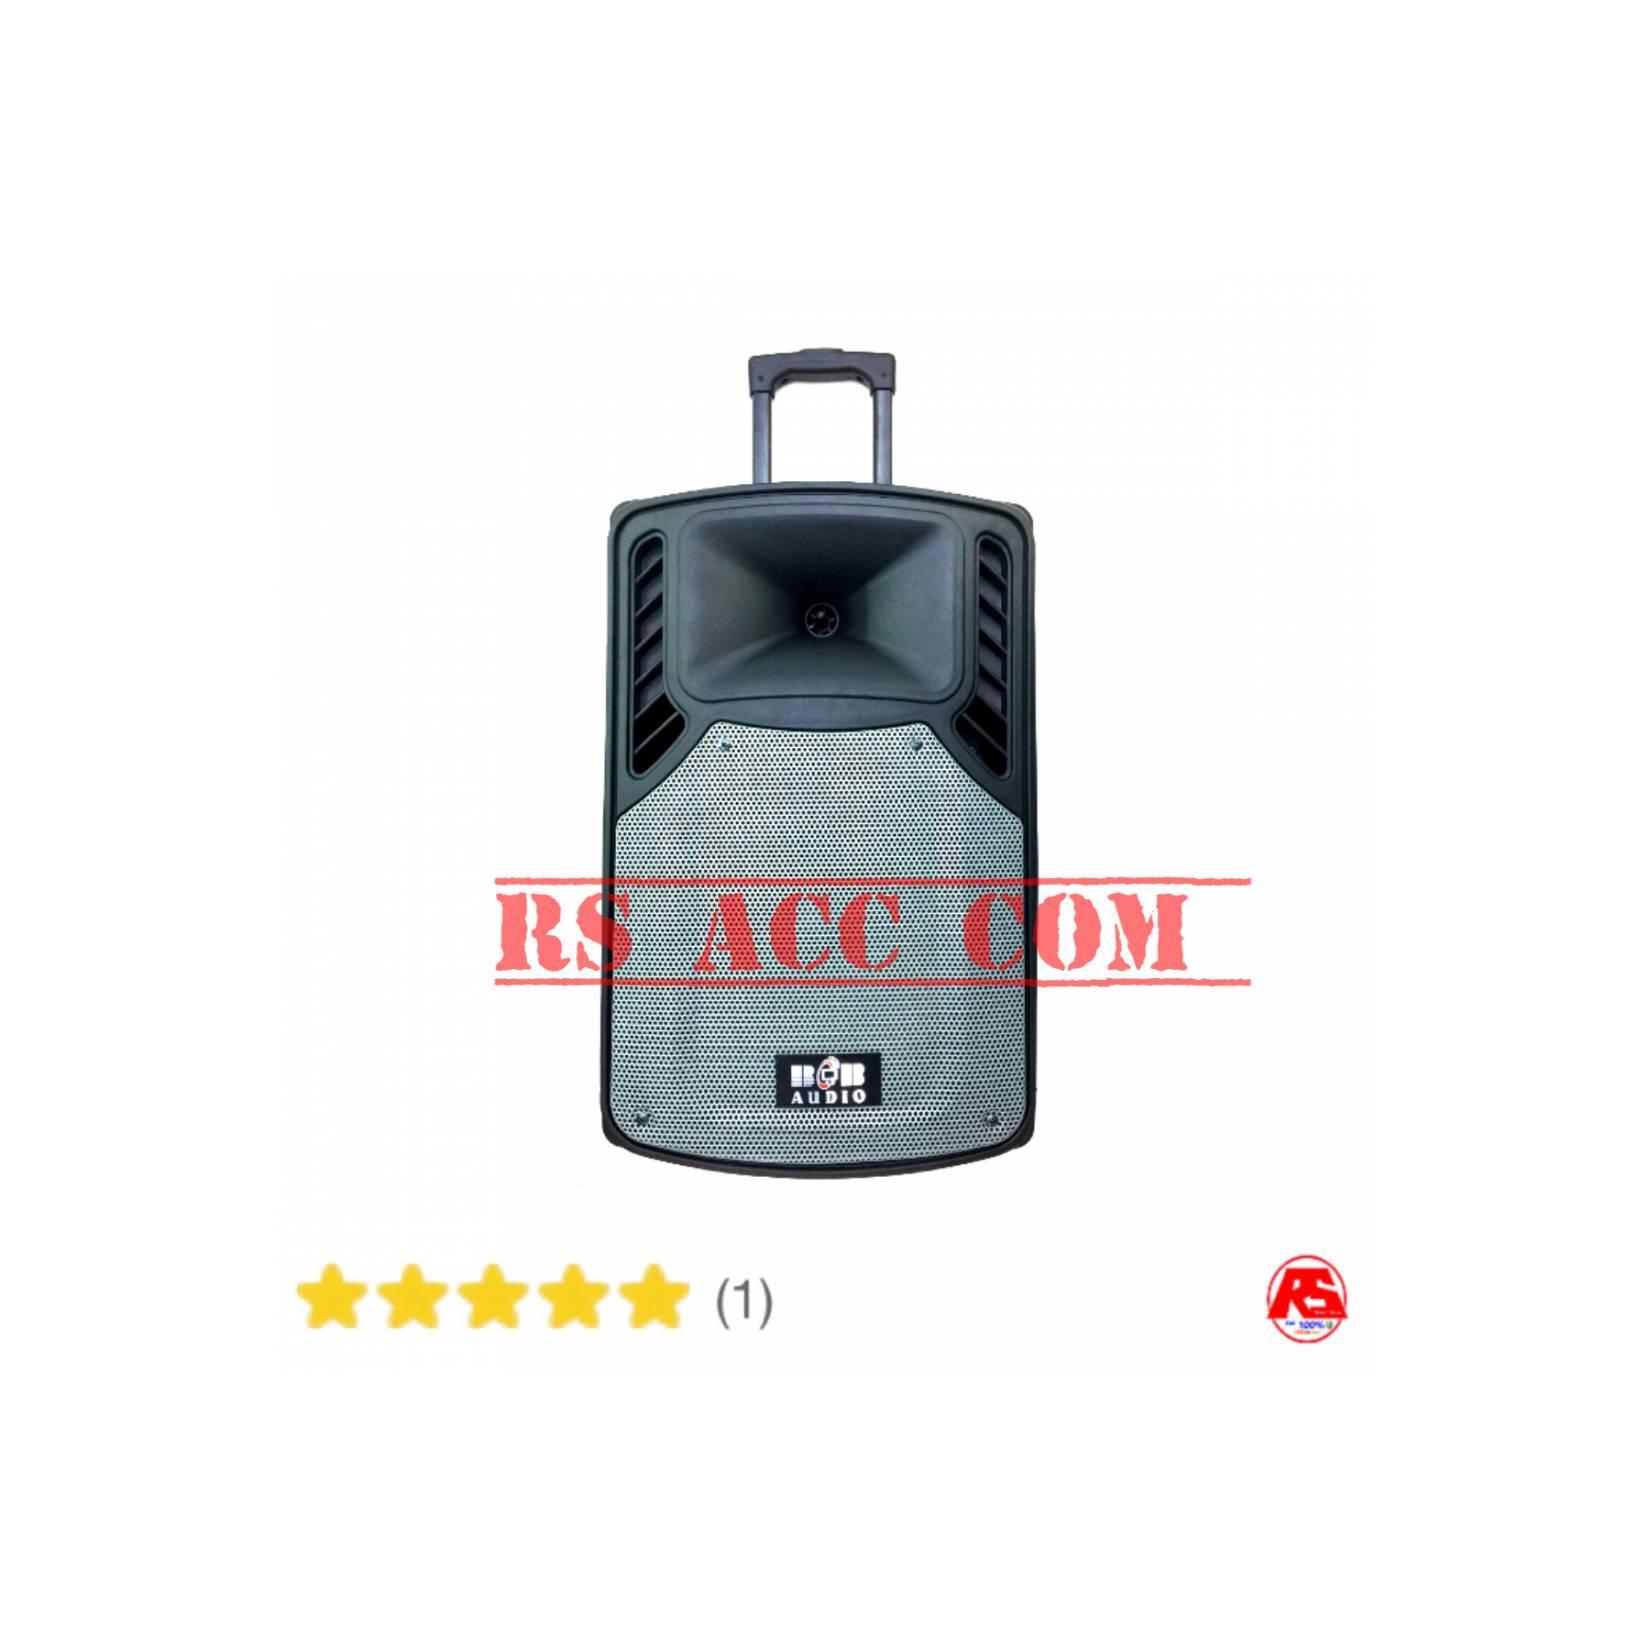 Speaker Portable Pa Addons Bob Audio 12 Inch 3 Mic Wireless Digital